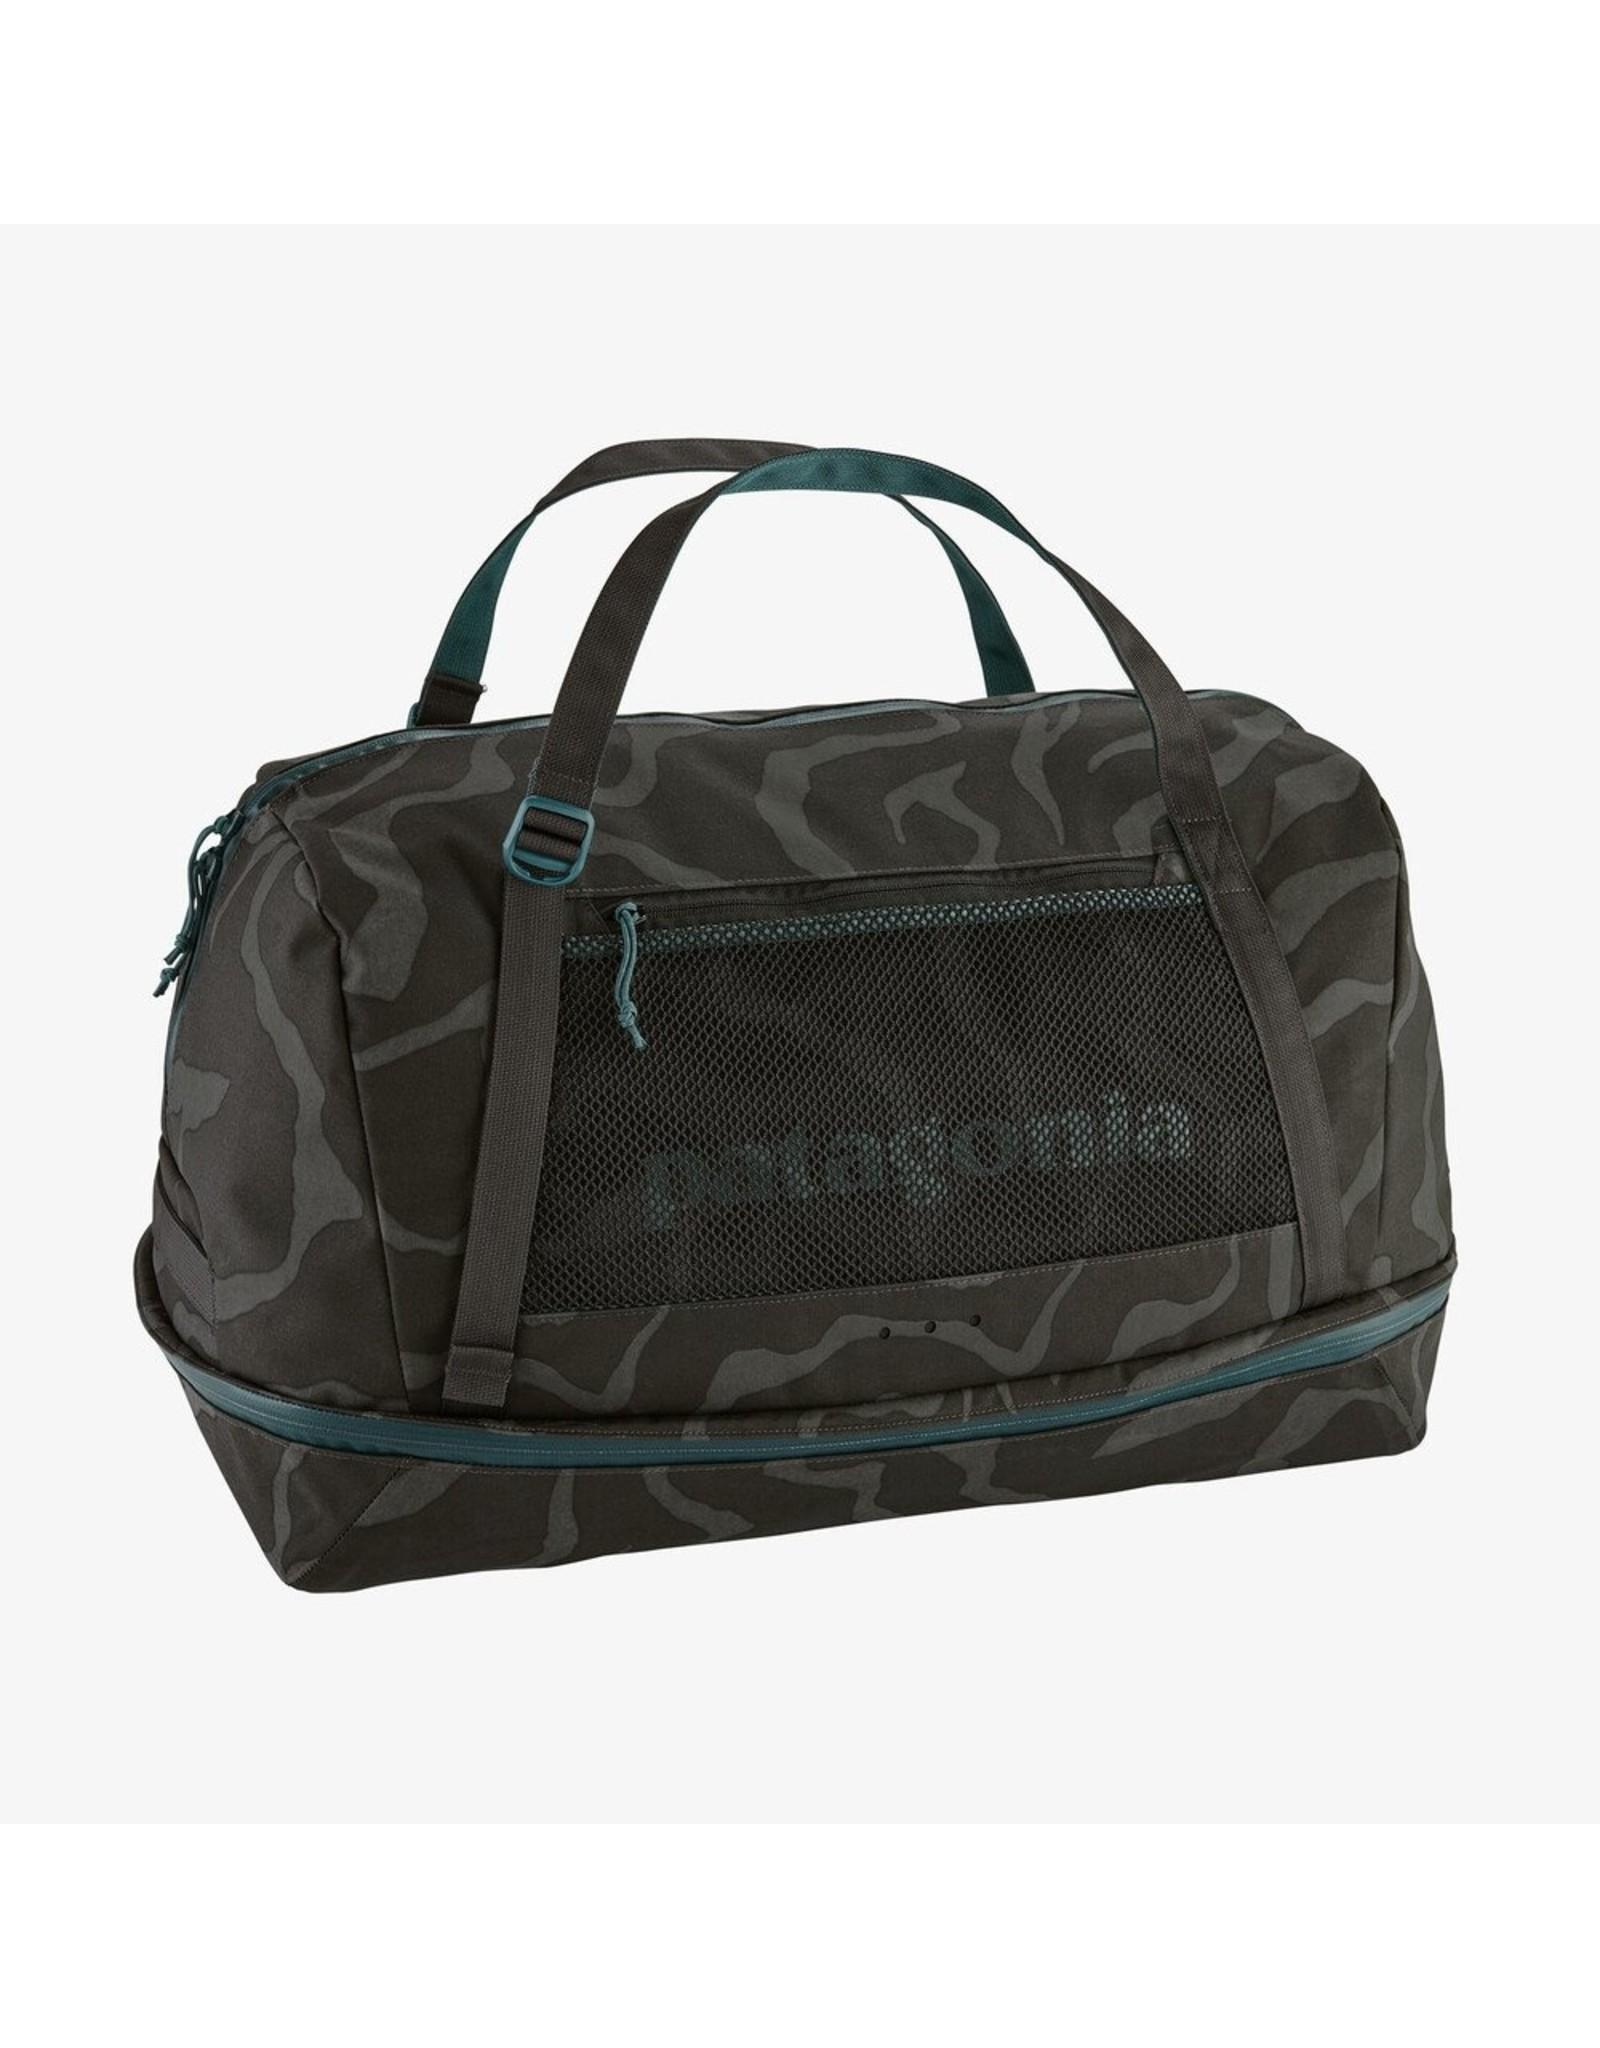 Patagonia Patagonia - Planing Duffel Bag